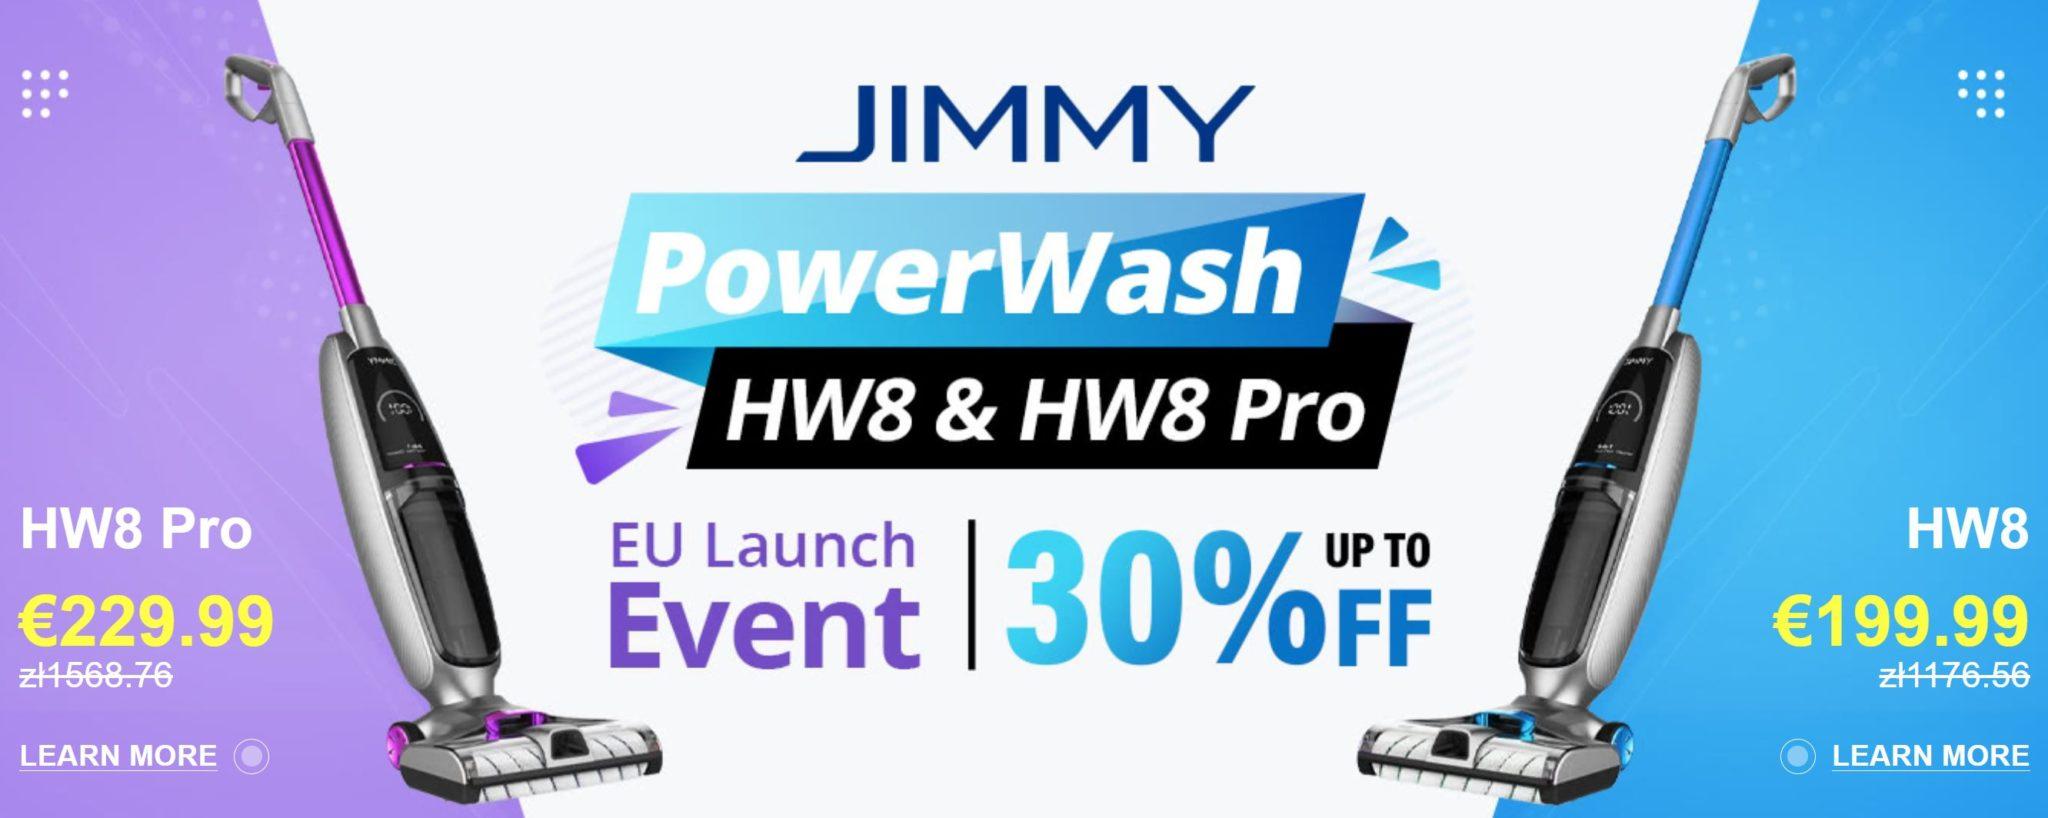 JIMMY PowerWash HW8 i HW8 PRO już w Europie - rabat do 30%